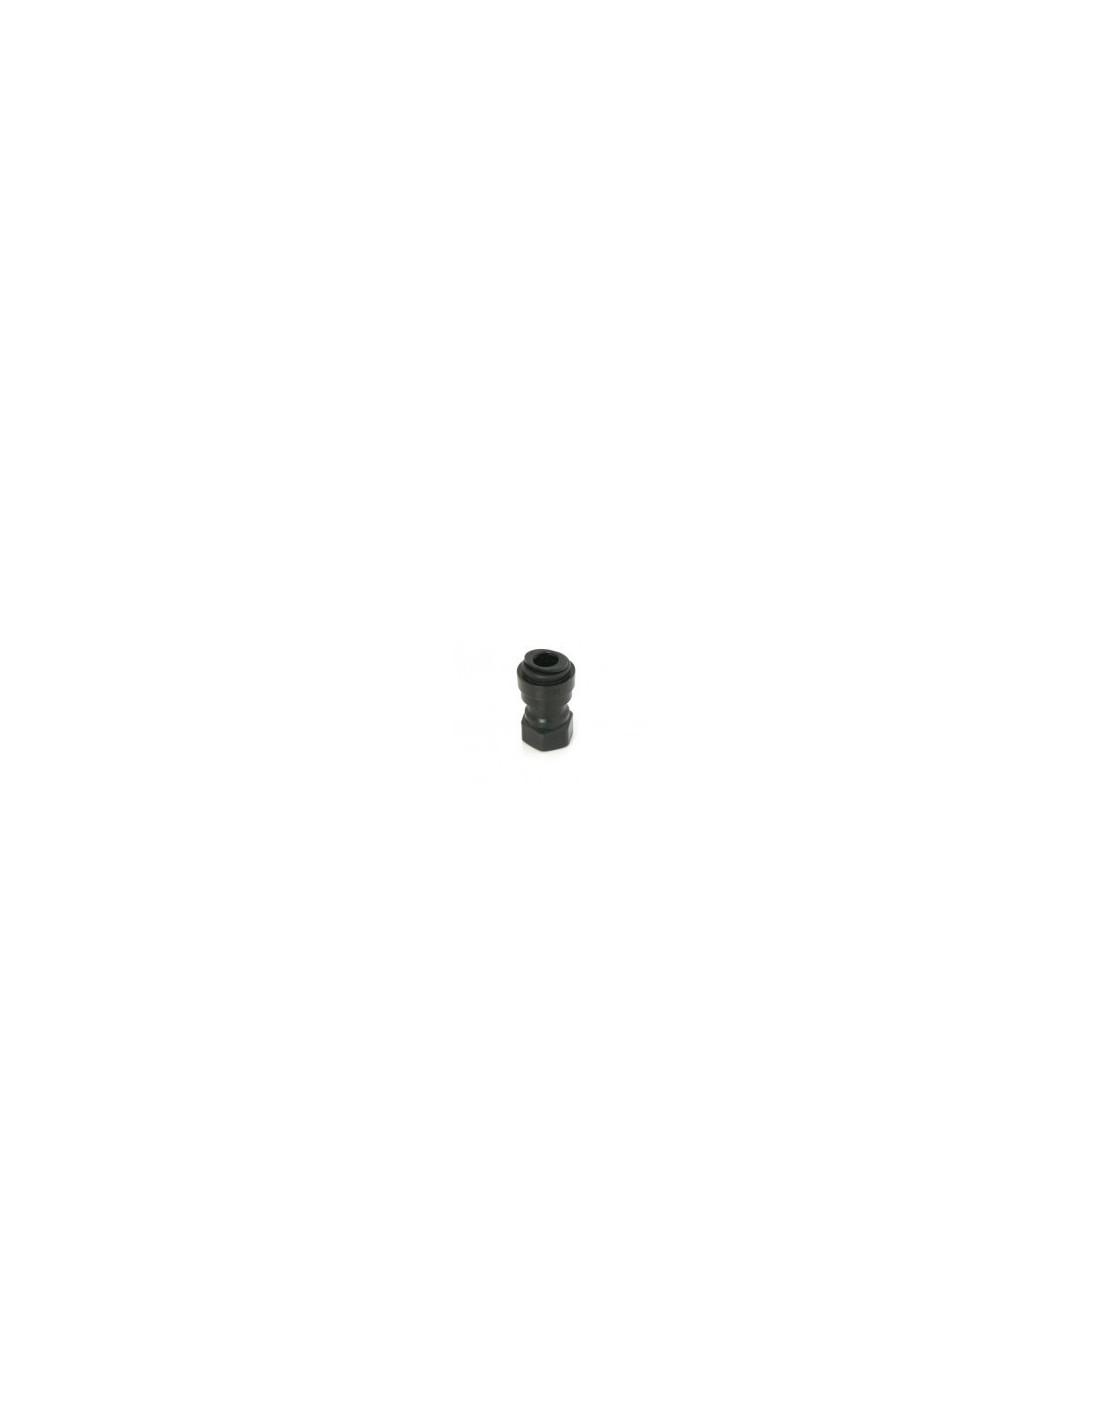 "SPO00469 - DM 1/8 x 8 mm (1/8"" x 5/16"")"